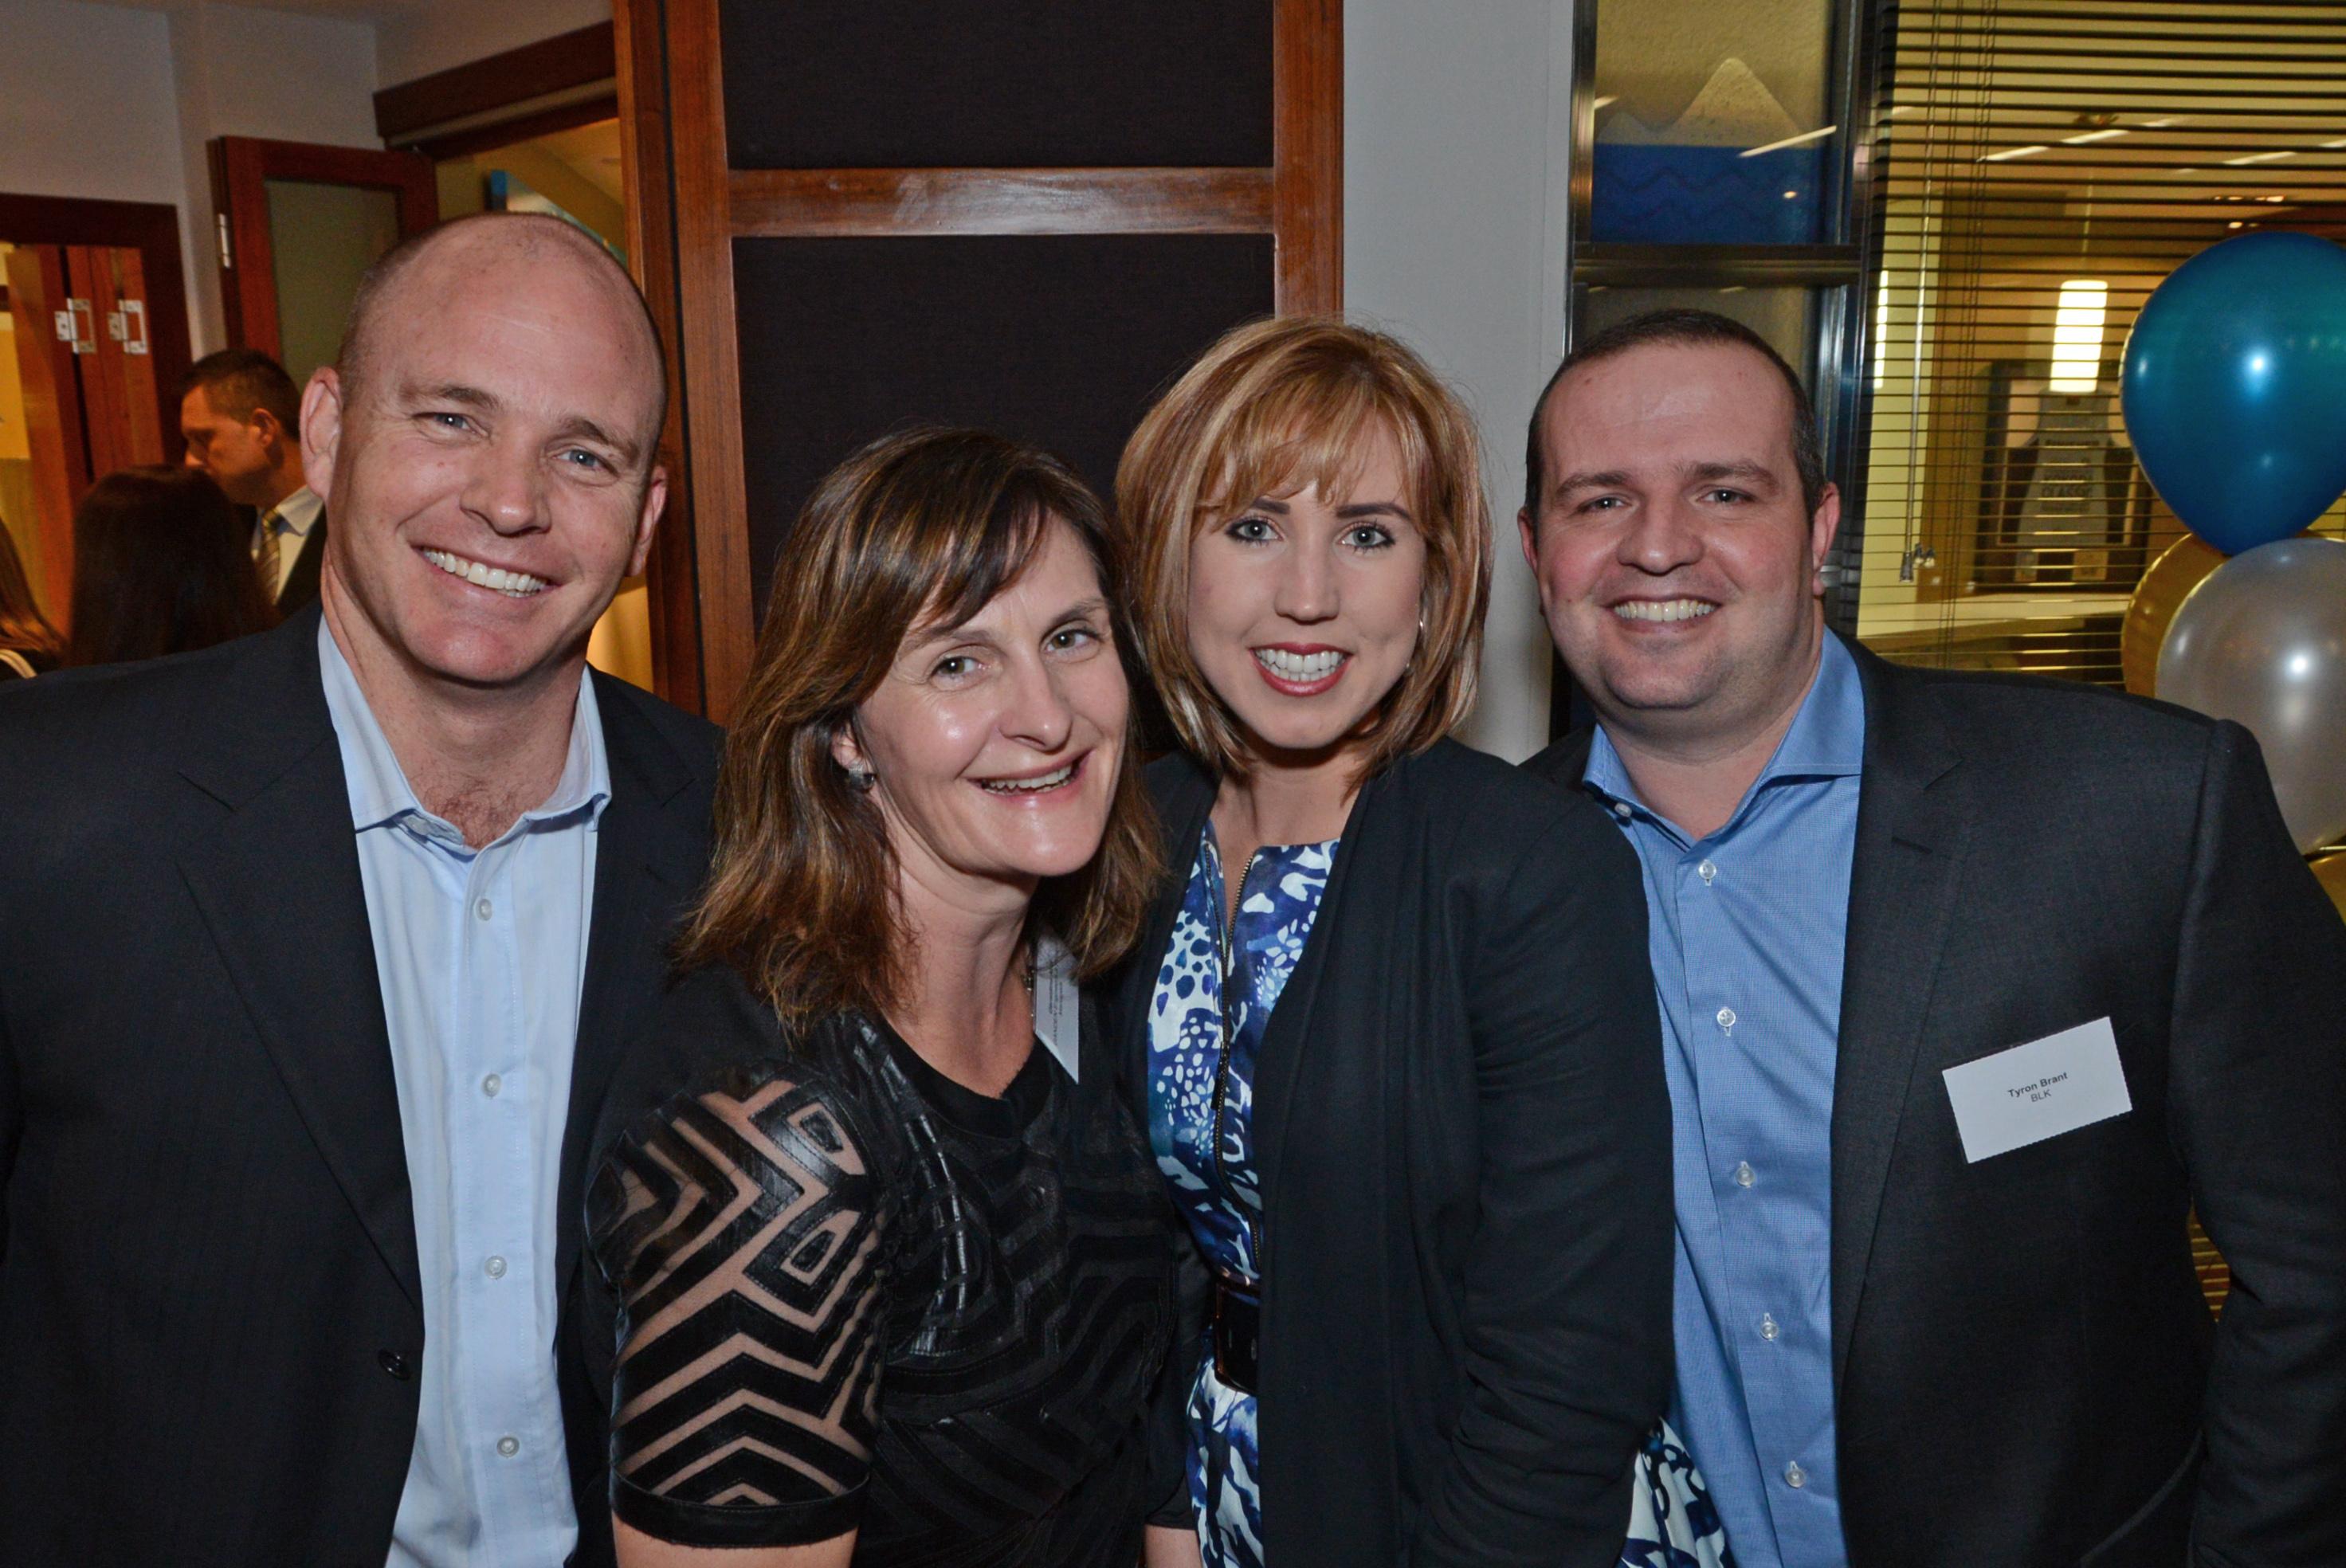 Michael Robinson, Geraldine Nutt, Georgia Merrett, Tyron Brant